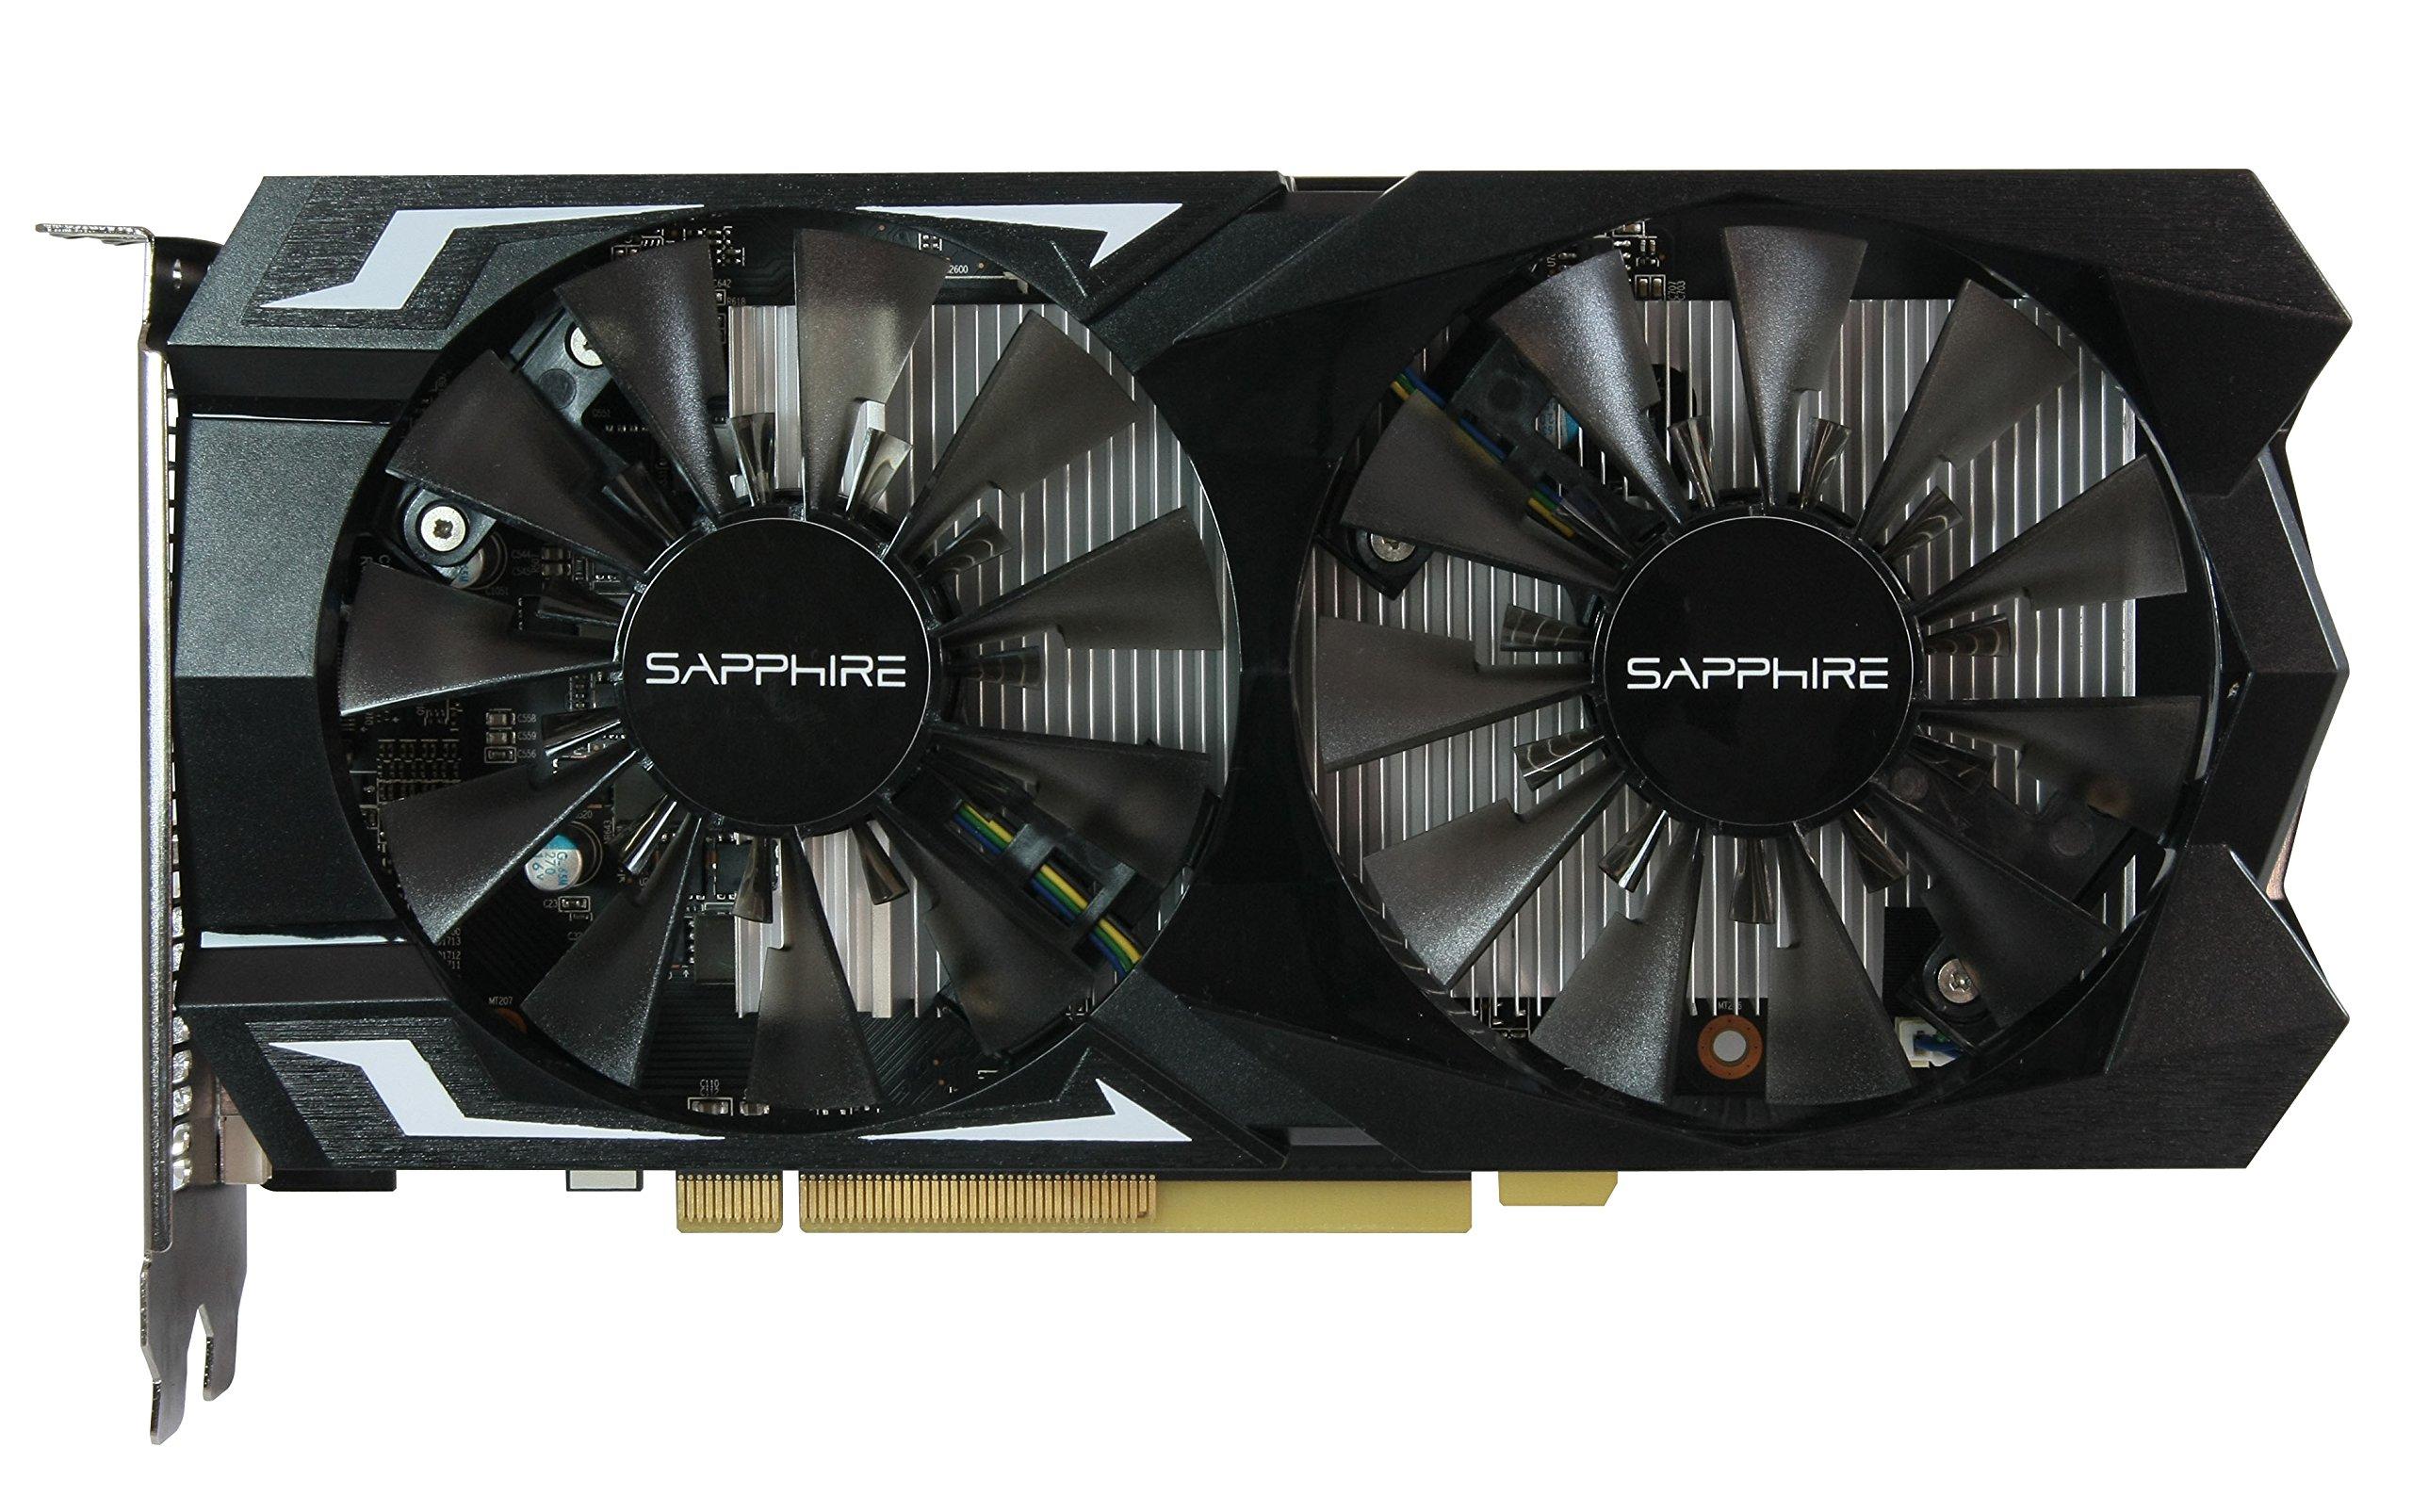 Sapphire Radeon Pulse RX 560 16CU 2GB GDDR5 HDMI / DVI-D / DP (UEFI) PCI-E Graphics Card